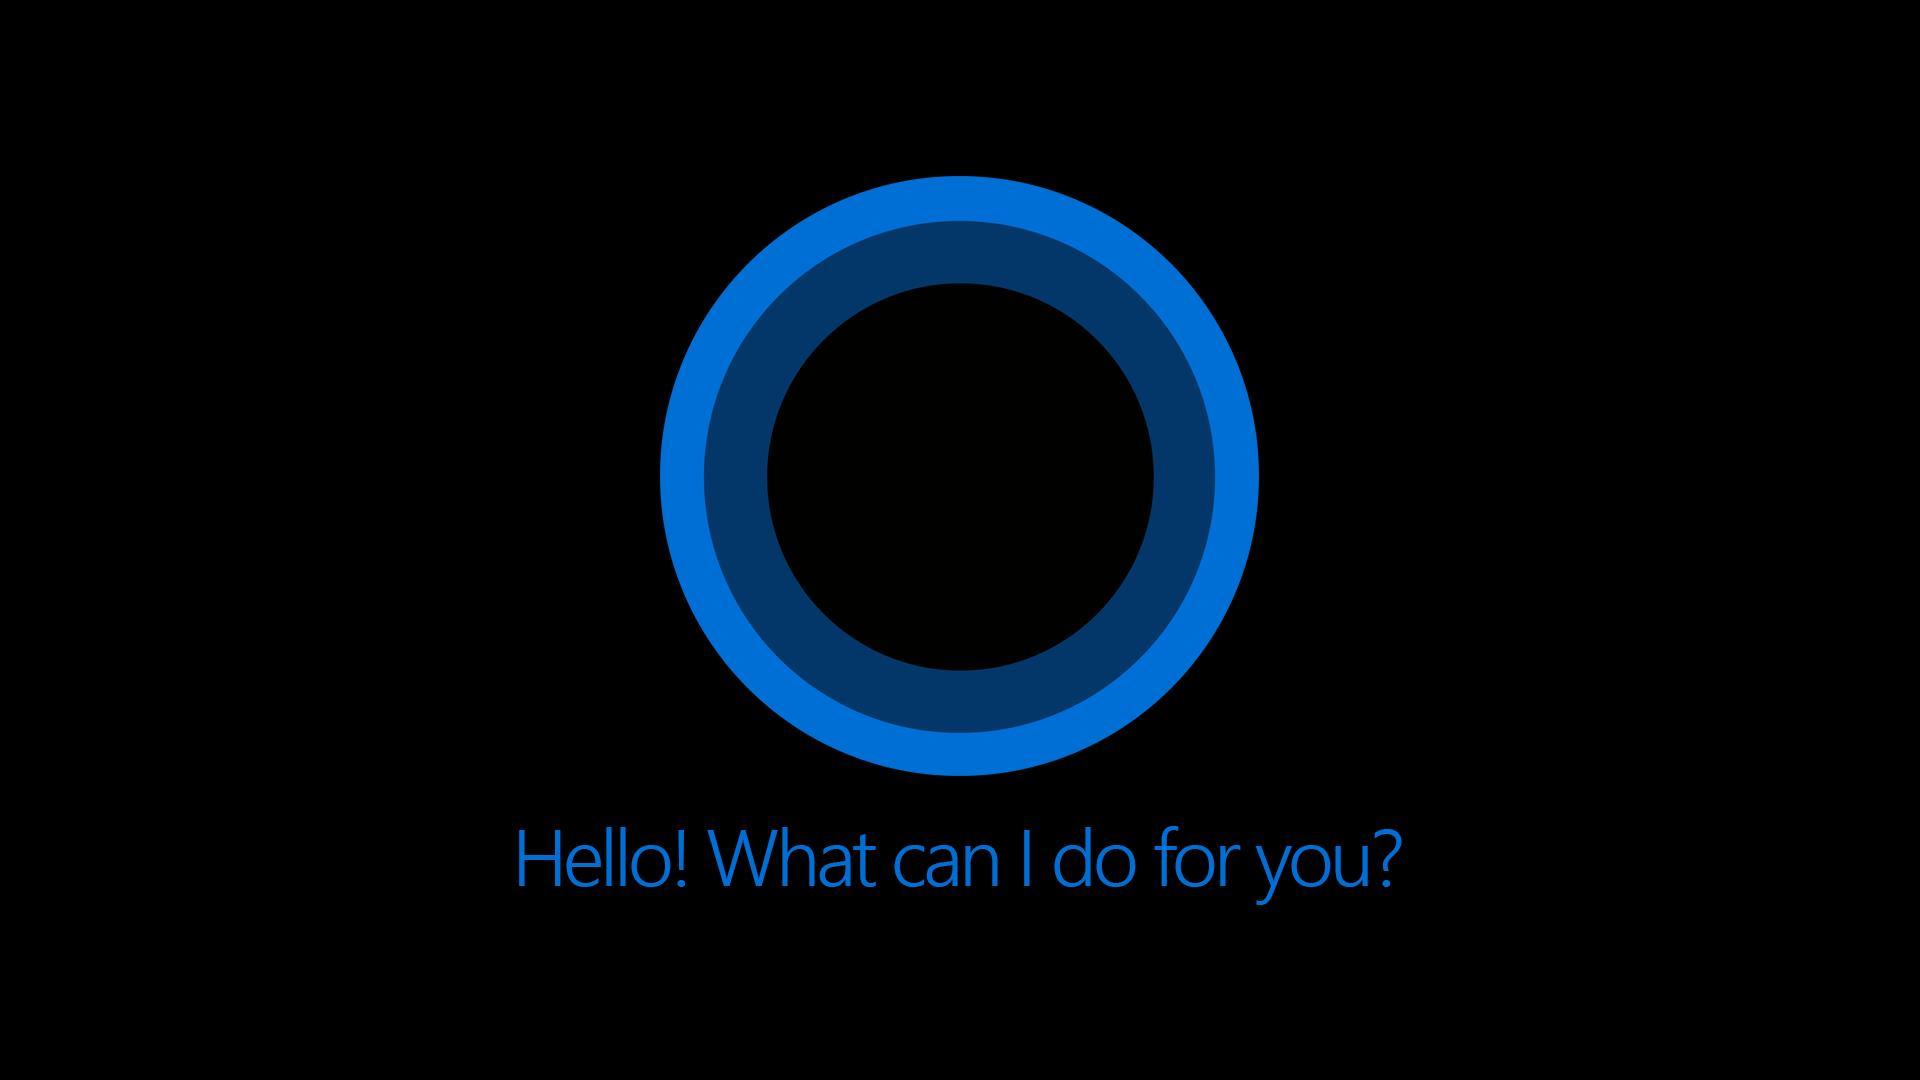 Cortana Windows 10 Wallpaper Supportive Guru